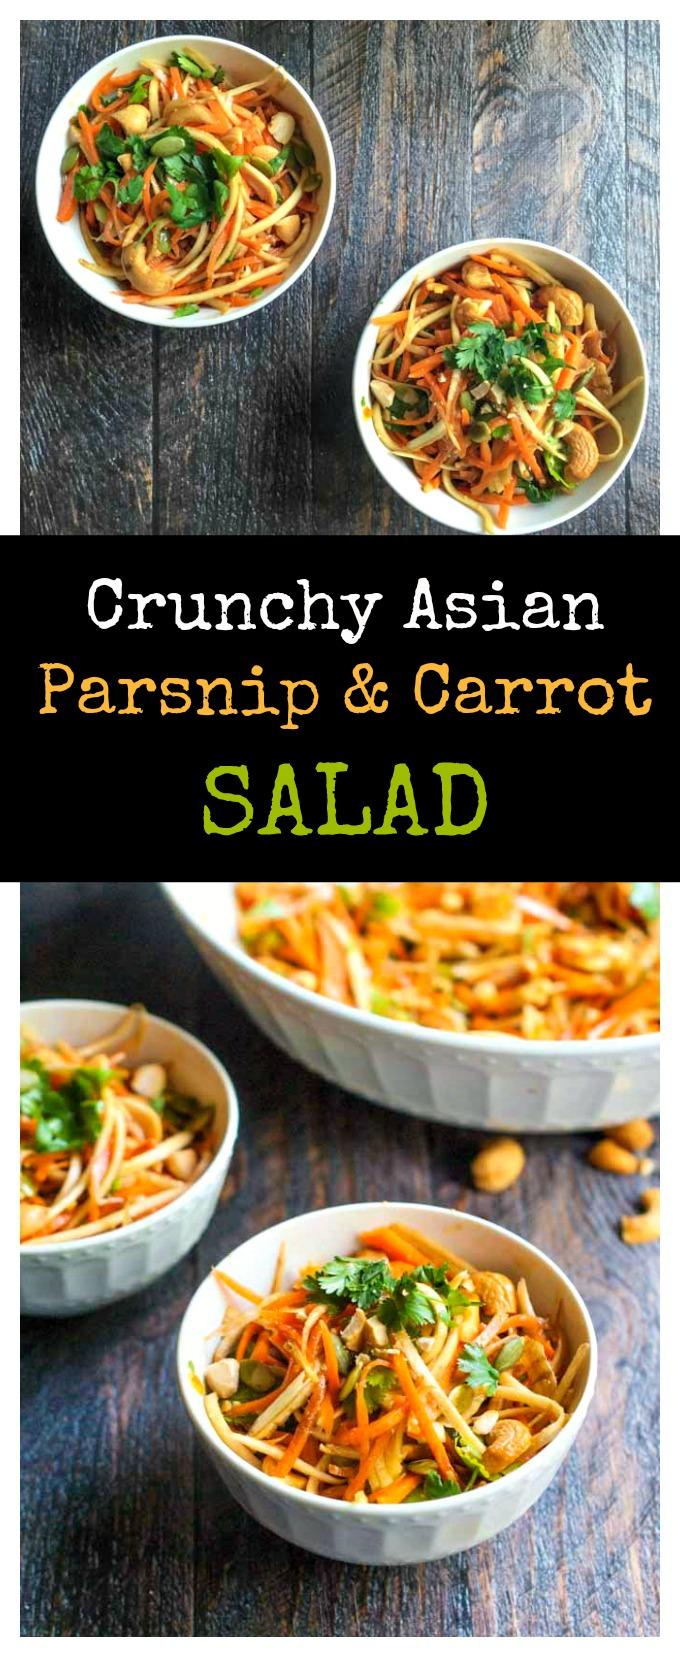 crunchy-asian-parsnip-carrot-salad-pinterest